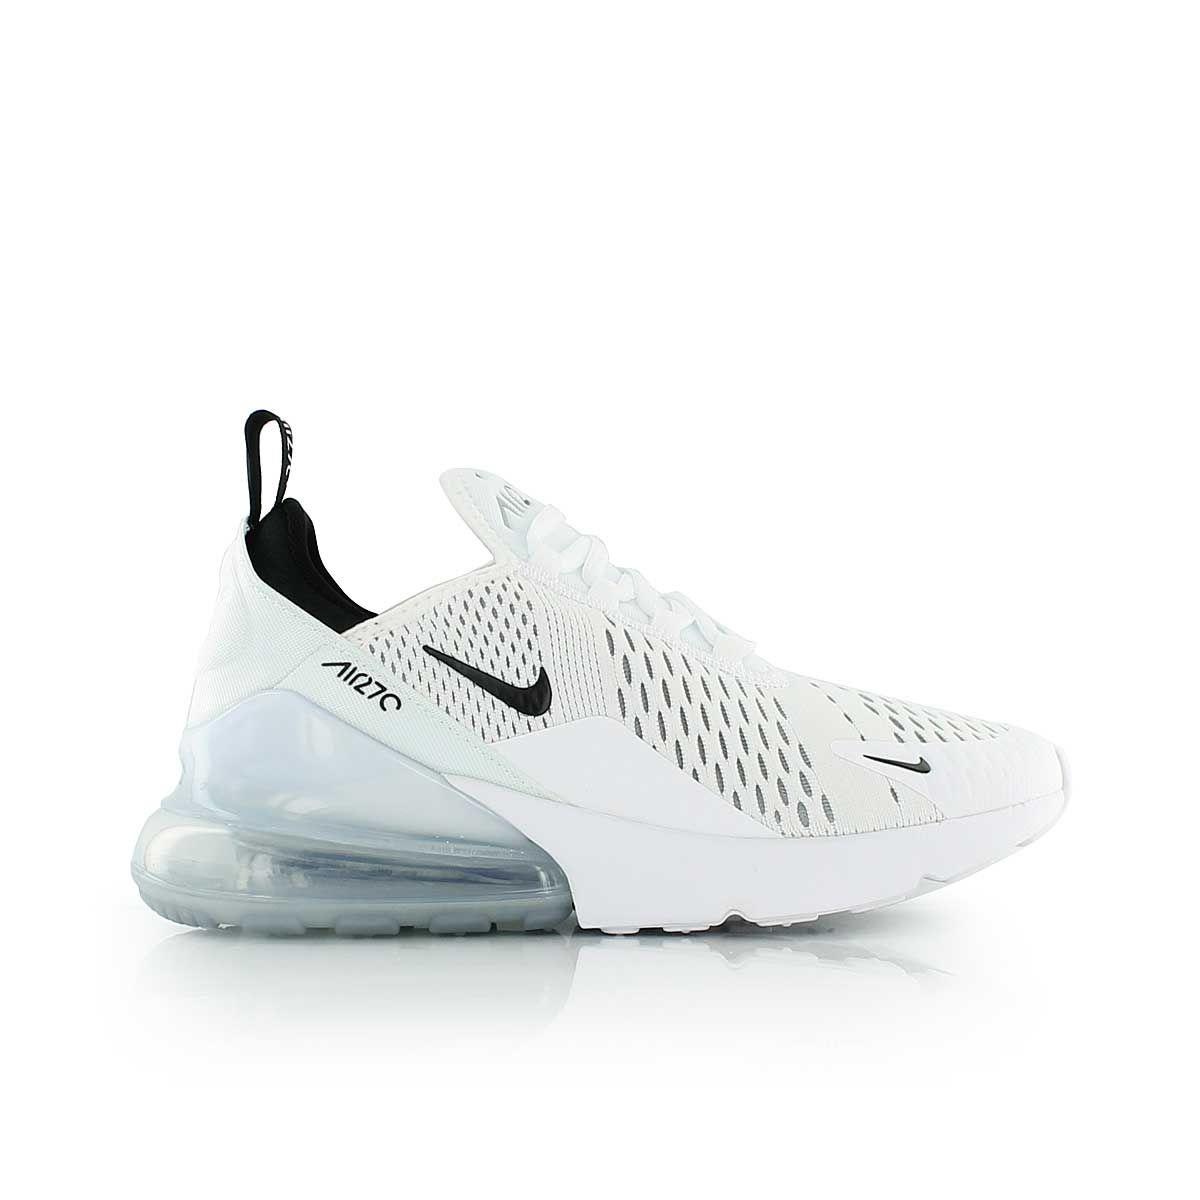 nike AIR MAX 270 (GS) WHITEBLACK WHITE | Nike air max mens